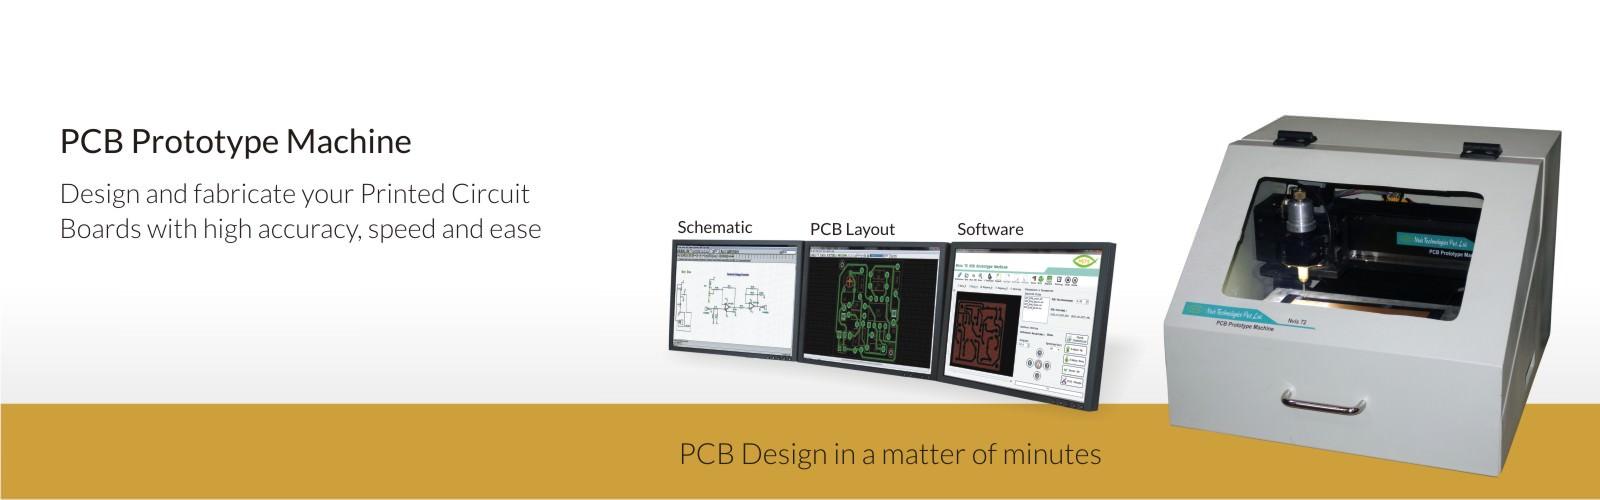 PCB Prototype Machine - Nvis 72